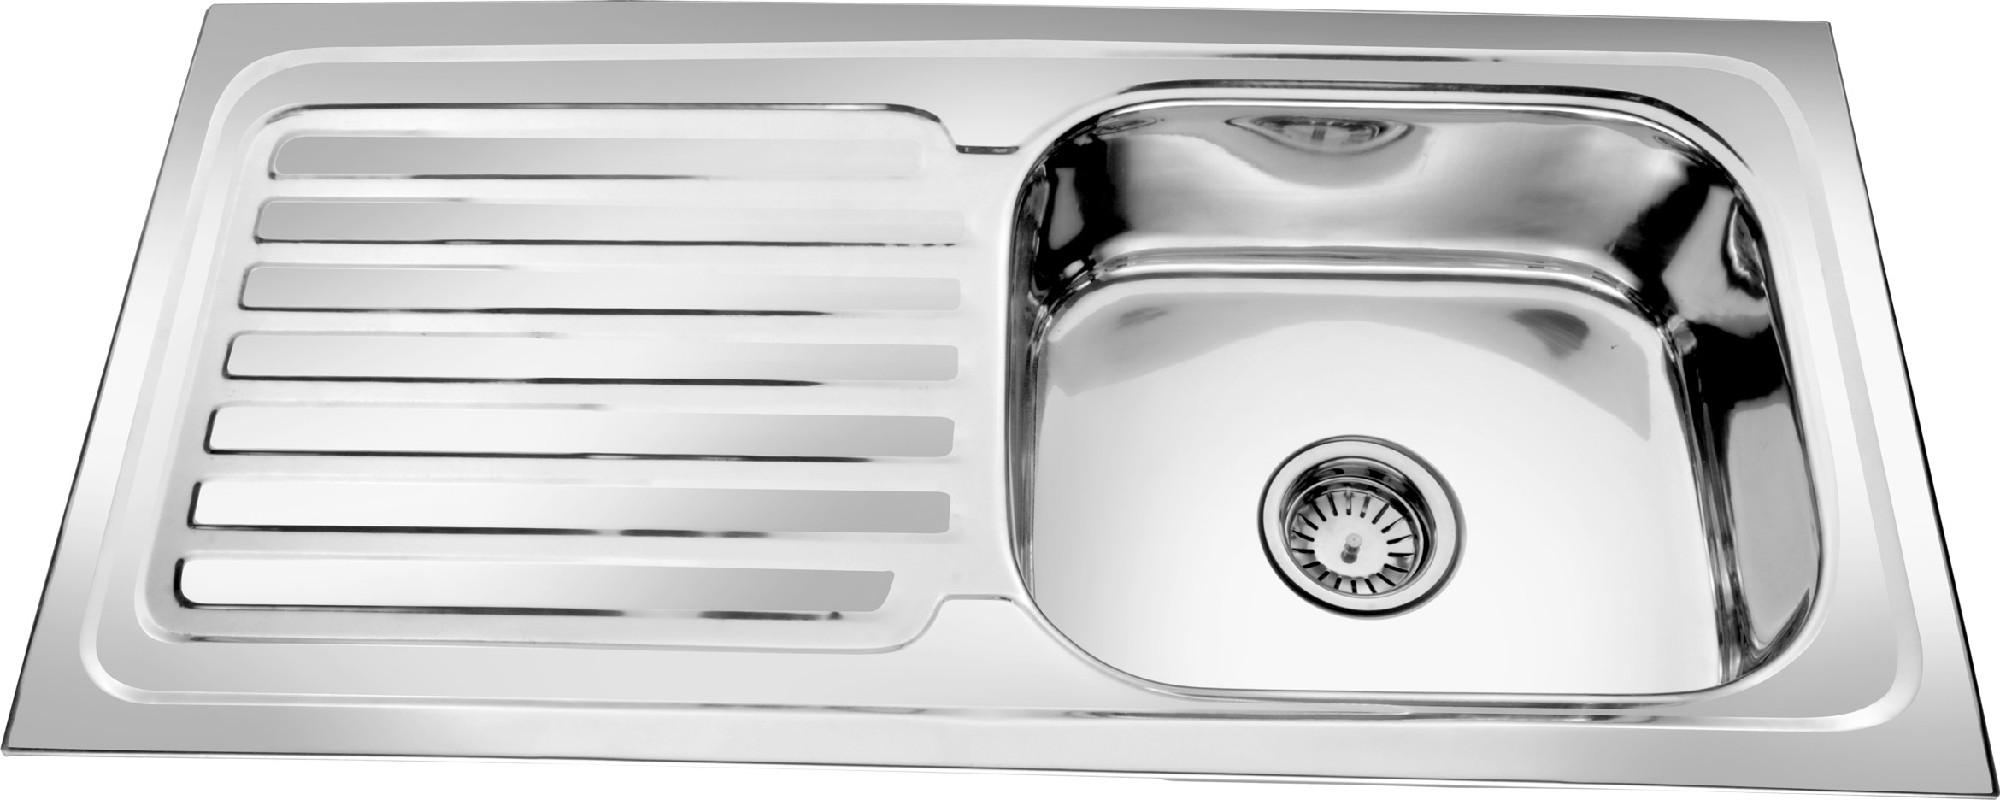 kitchen sinks with drain boards dinette sets sink board ideas